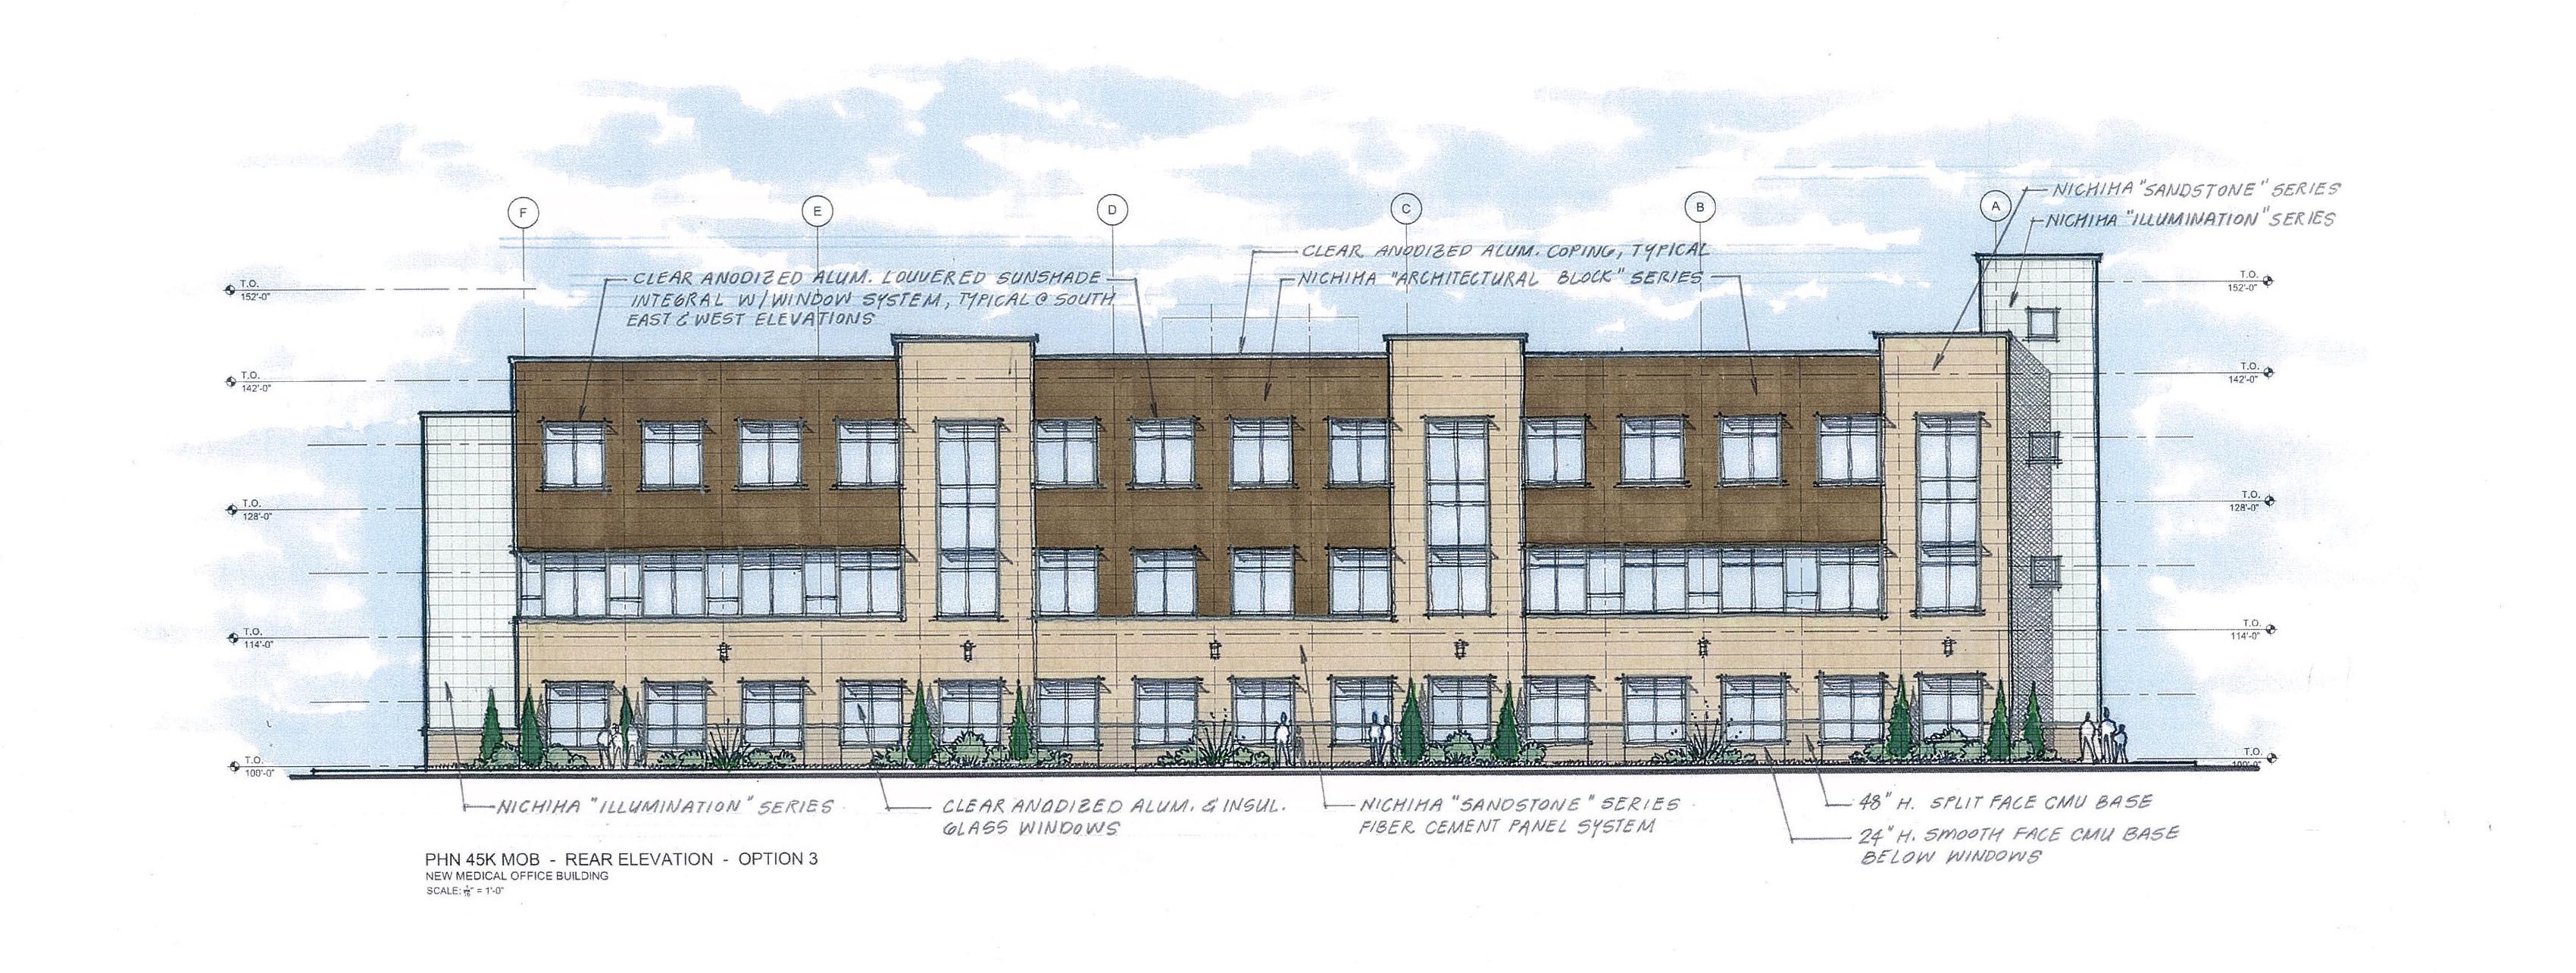 PHN Lewistown | Core Architects llc - Pittsburgh